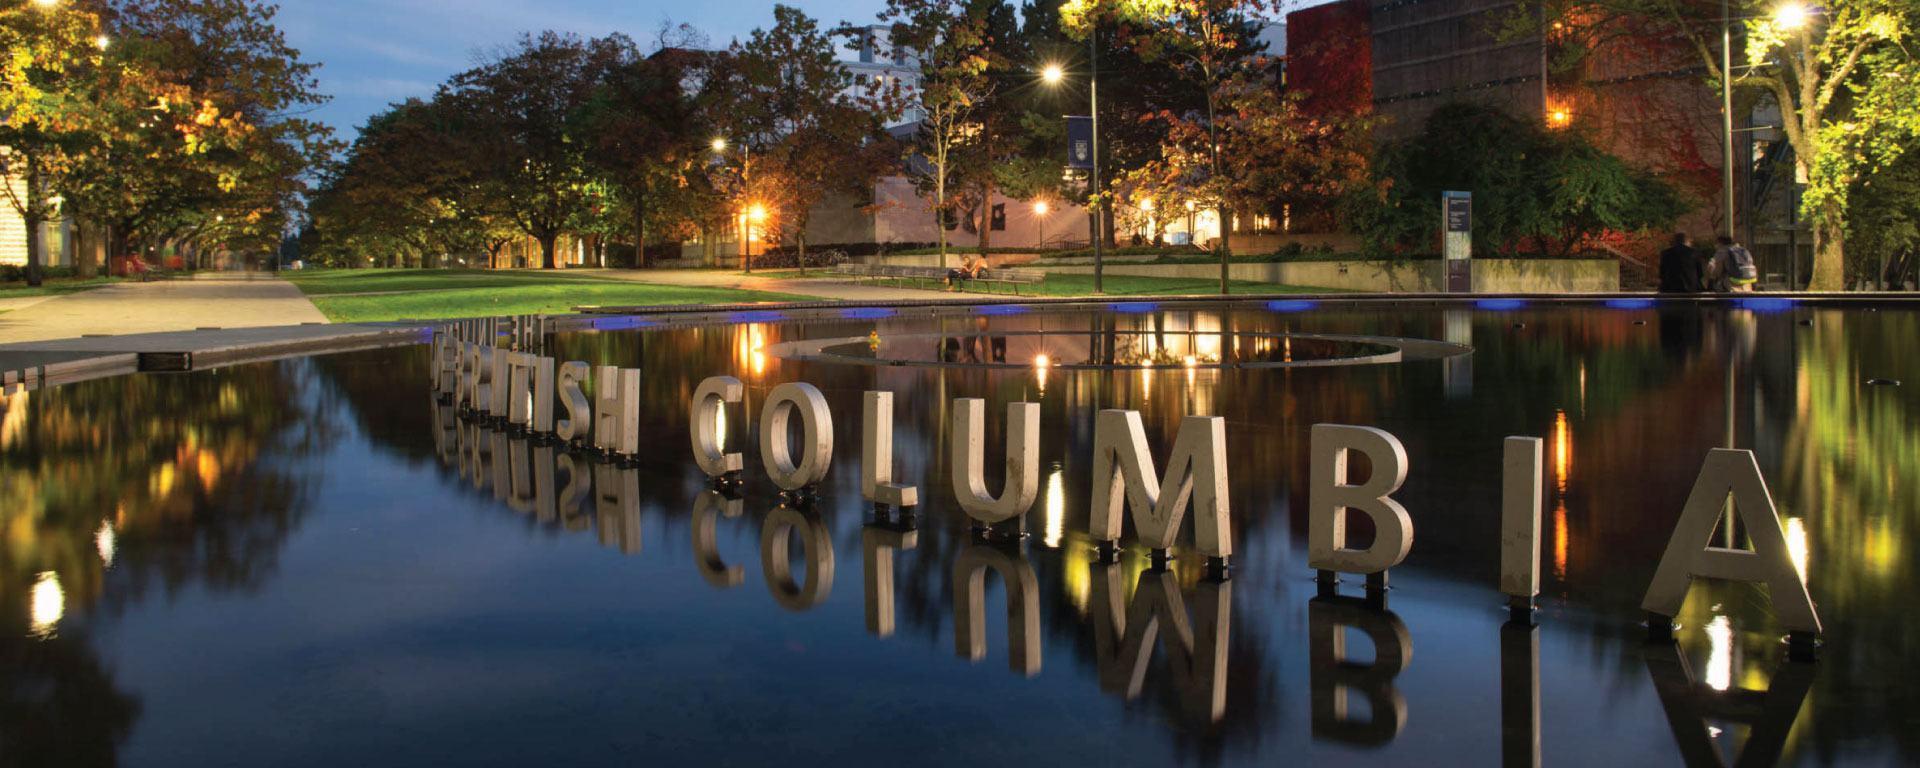 دانشگاه بریتیش کلمبیا